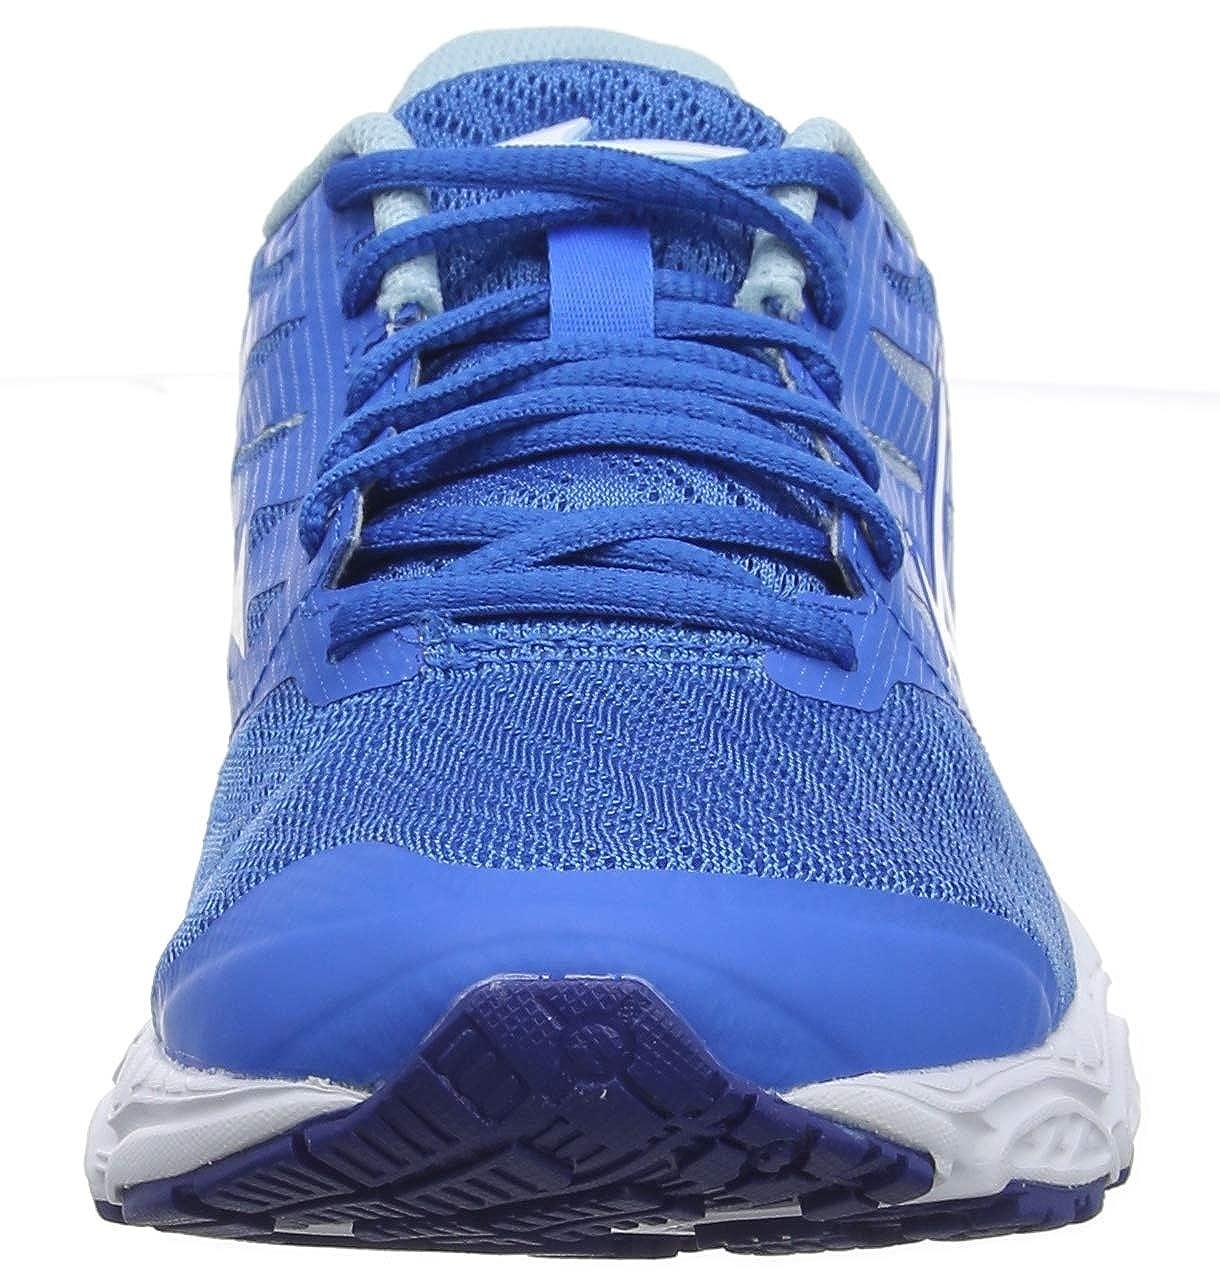 Mizuno Wave Prodigy 2 Zapatillas de Running para Mujer